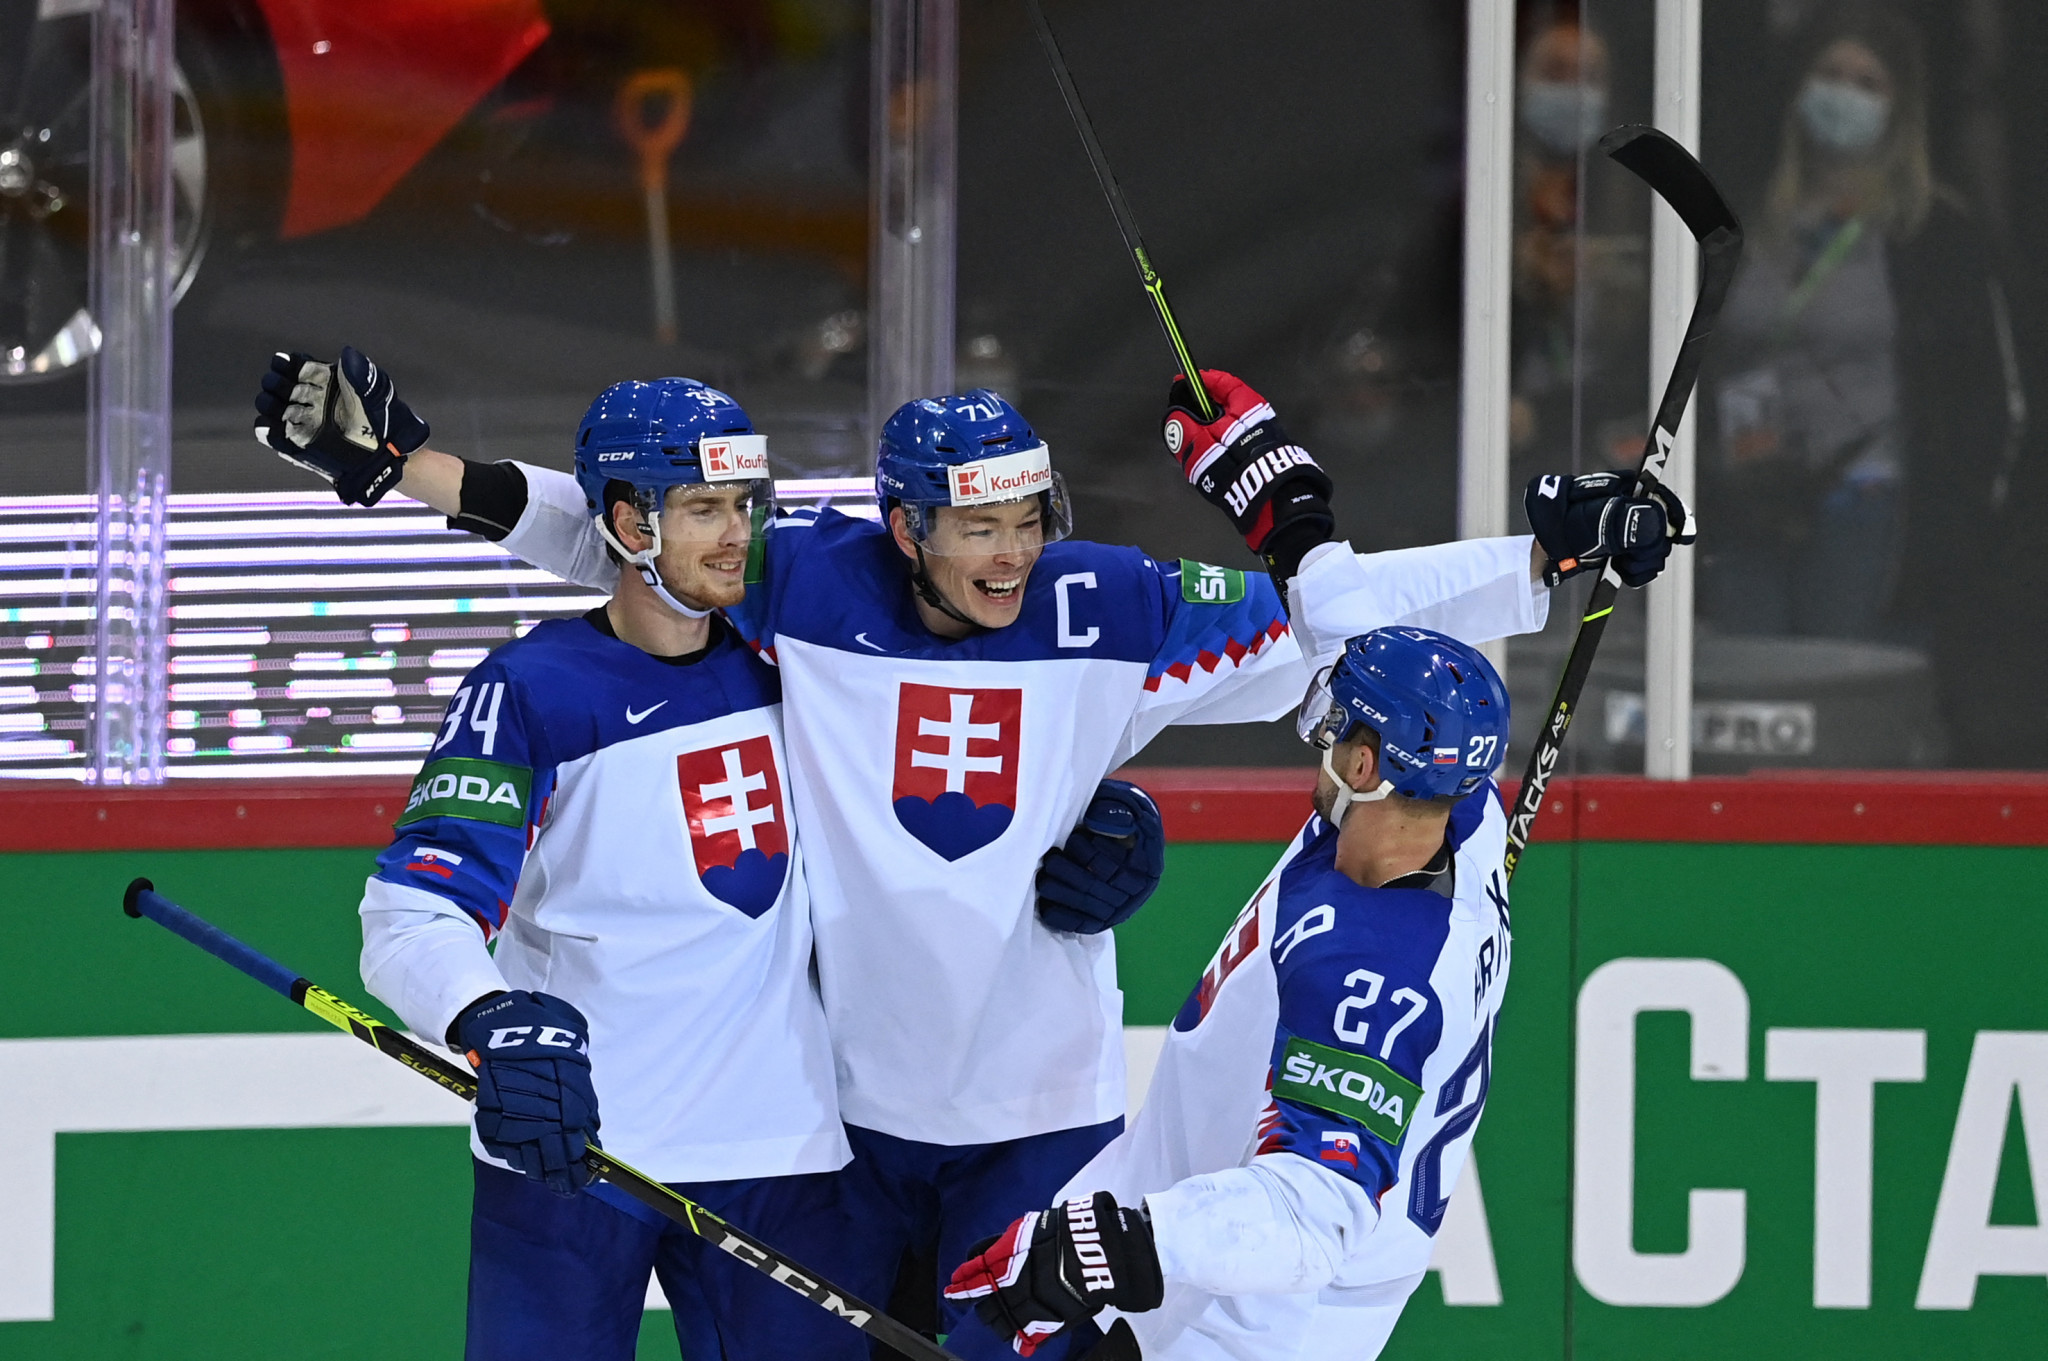 Three wins on spin for Slovakia at IIHF Men's World Championship